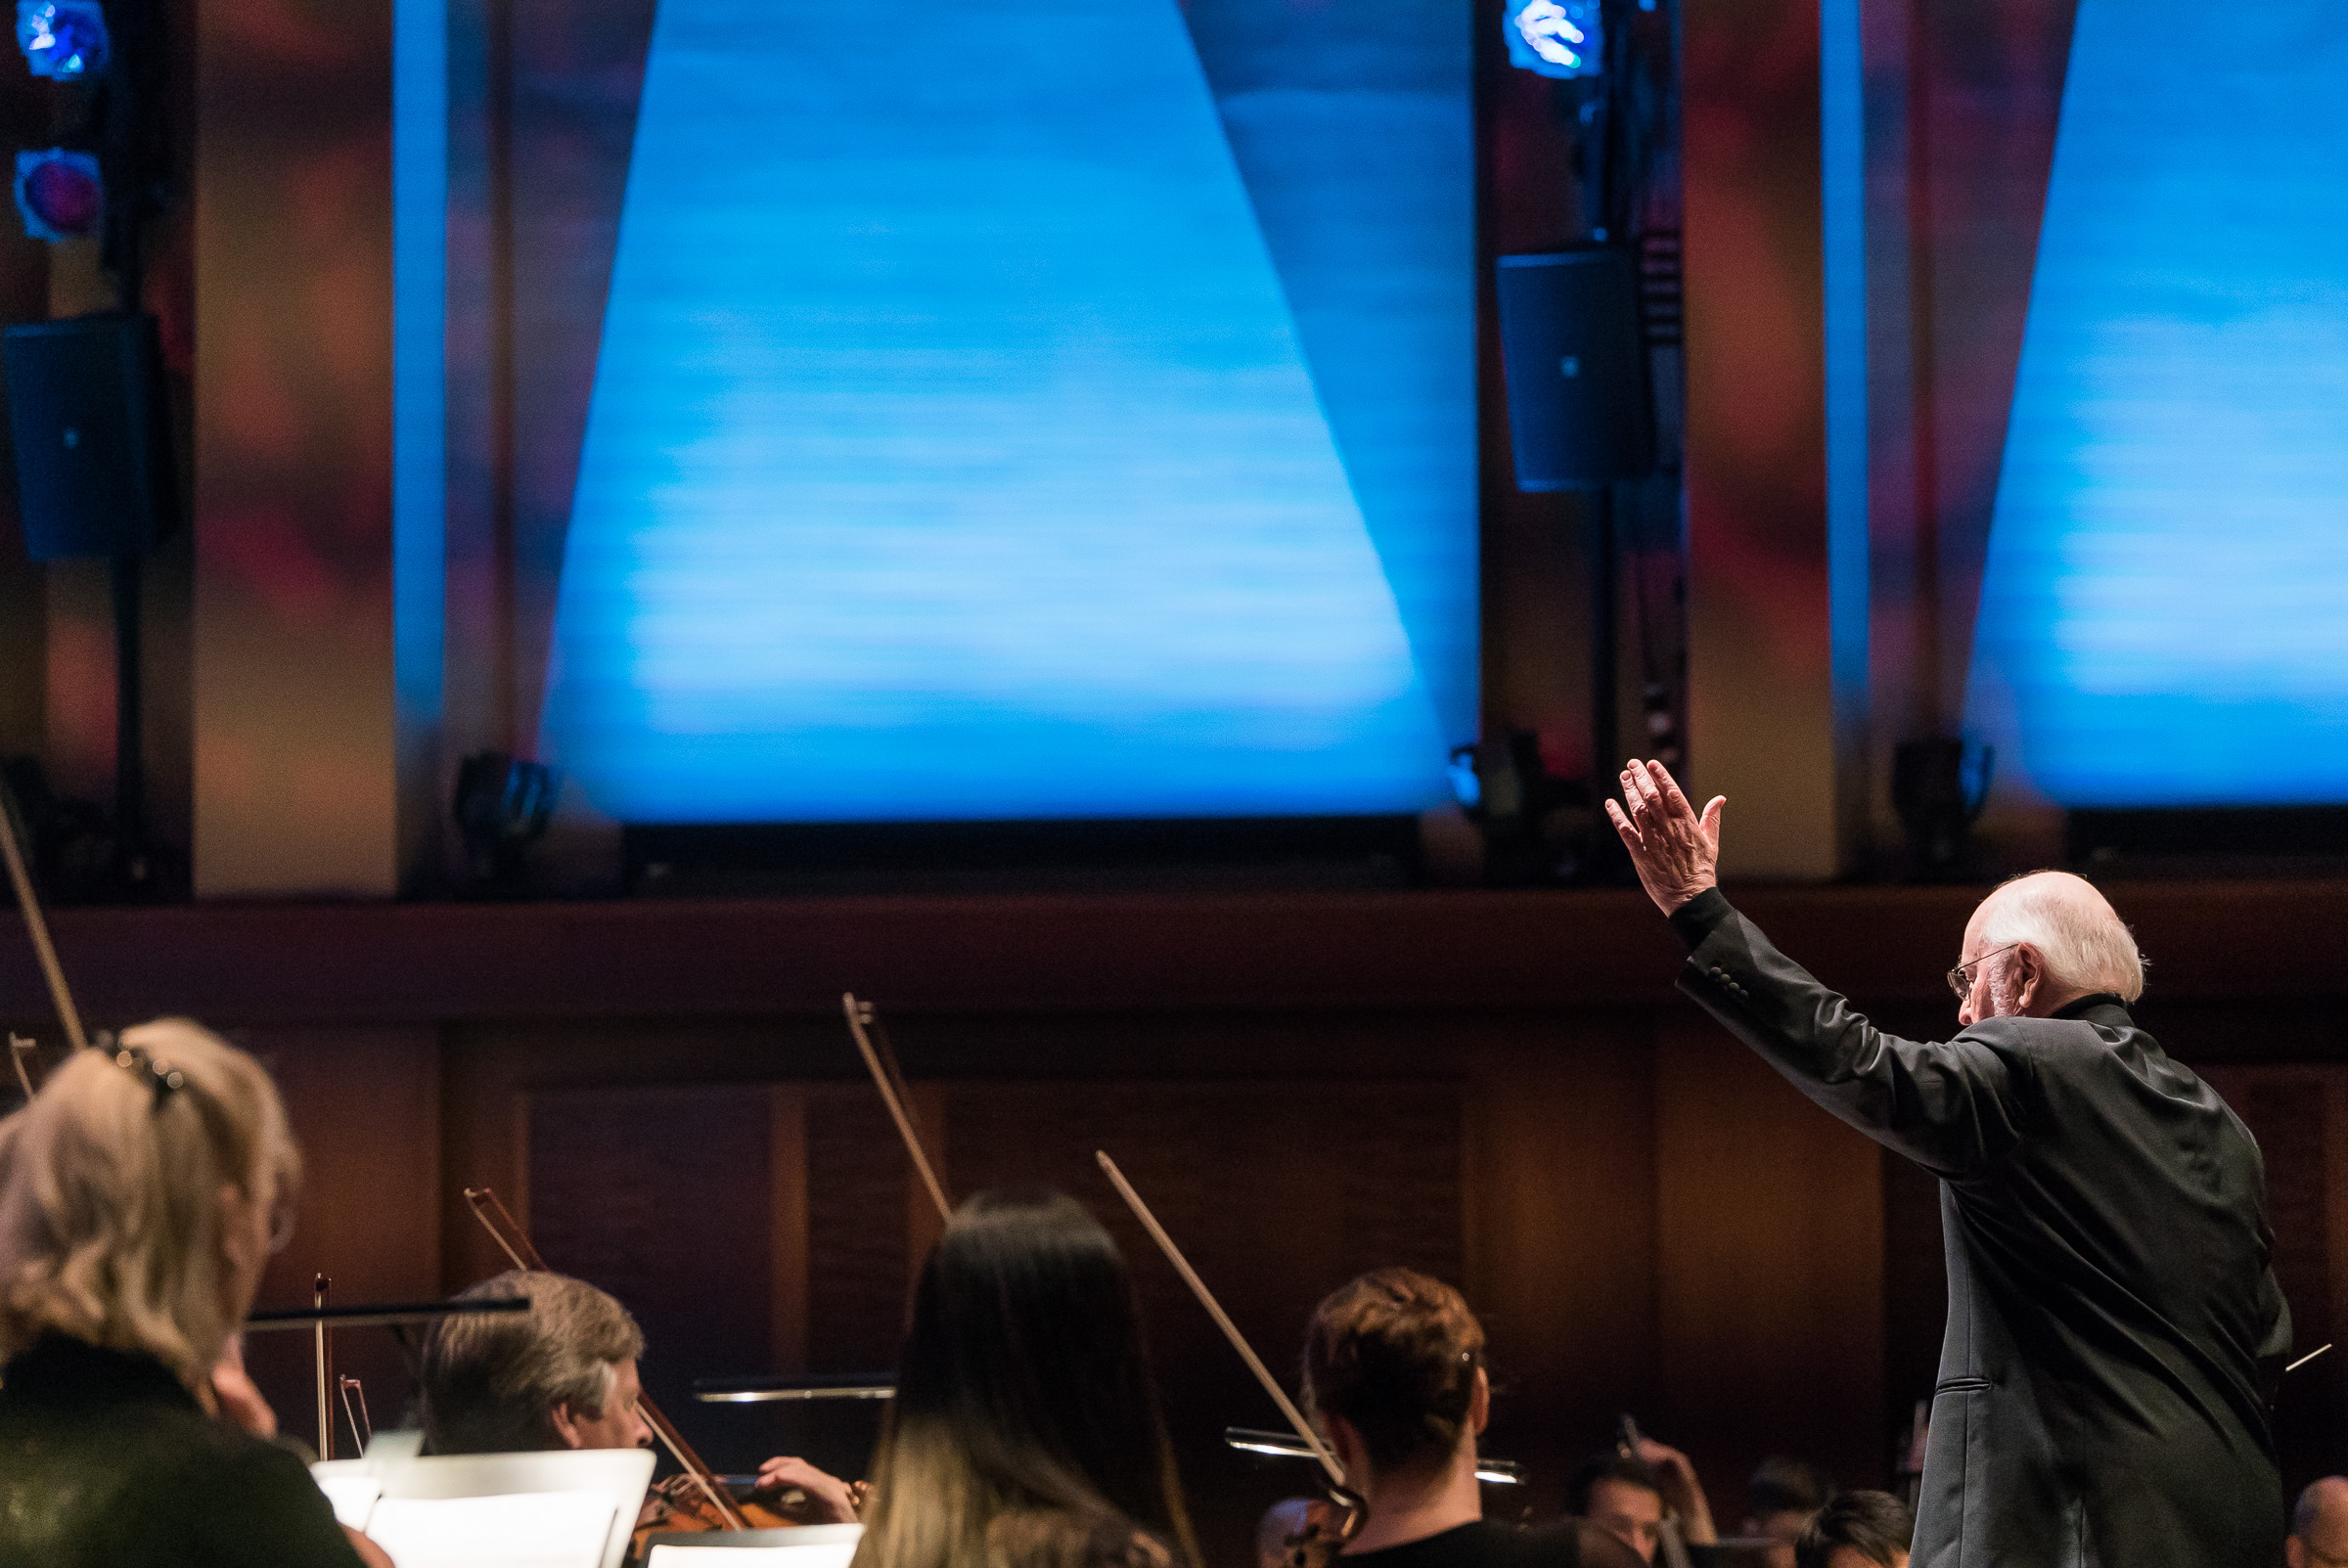 brandon_patoc_john_williams_Steven_Spielberg, Seattle_Symphony_Orchestra_Conert_0020.JPG